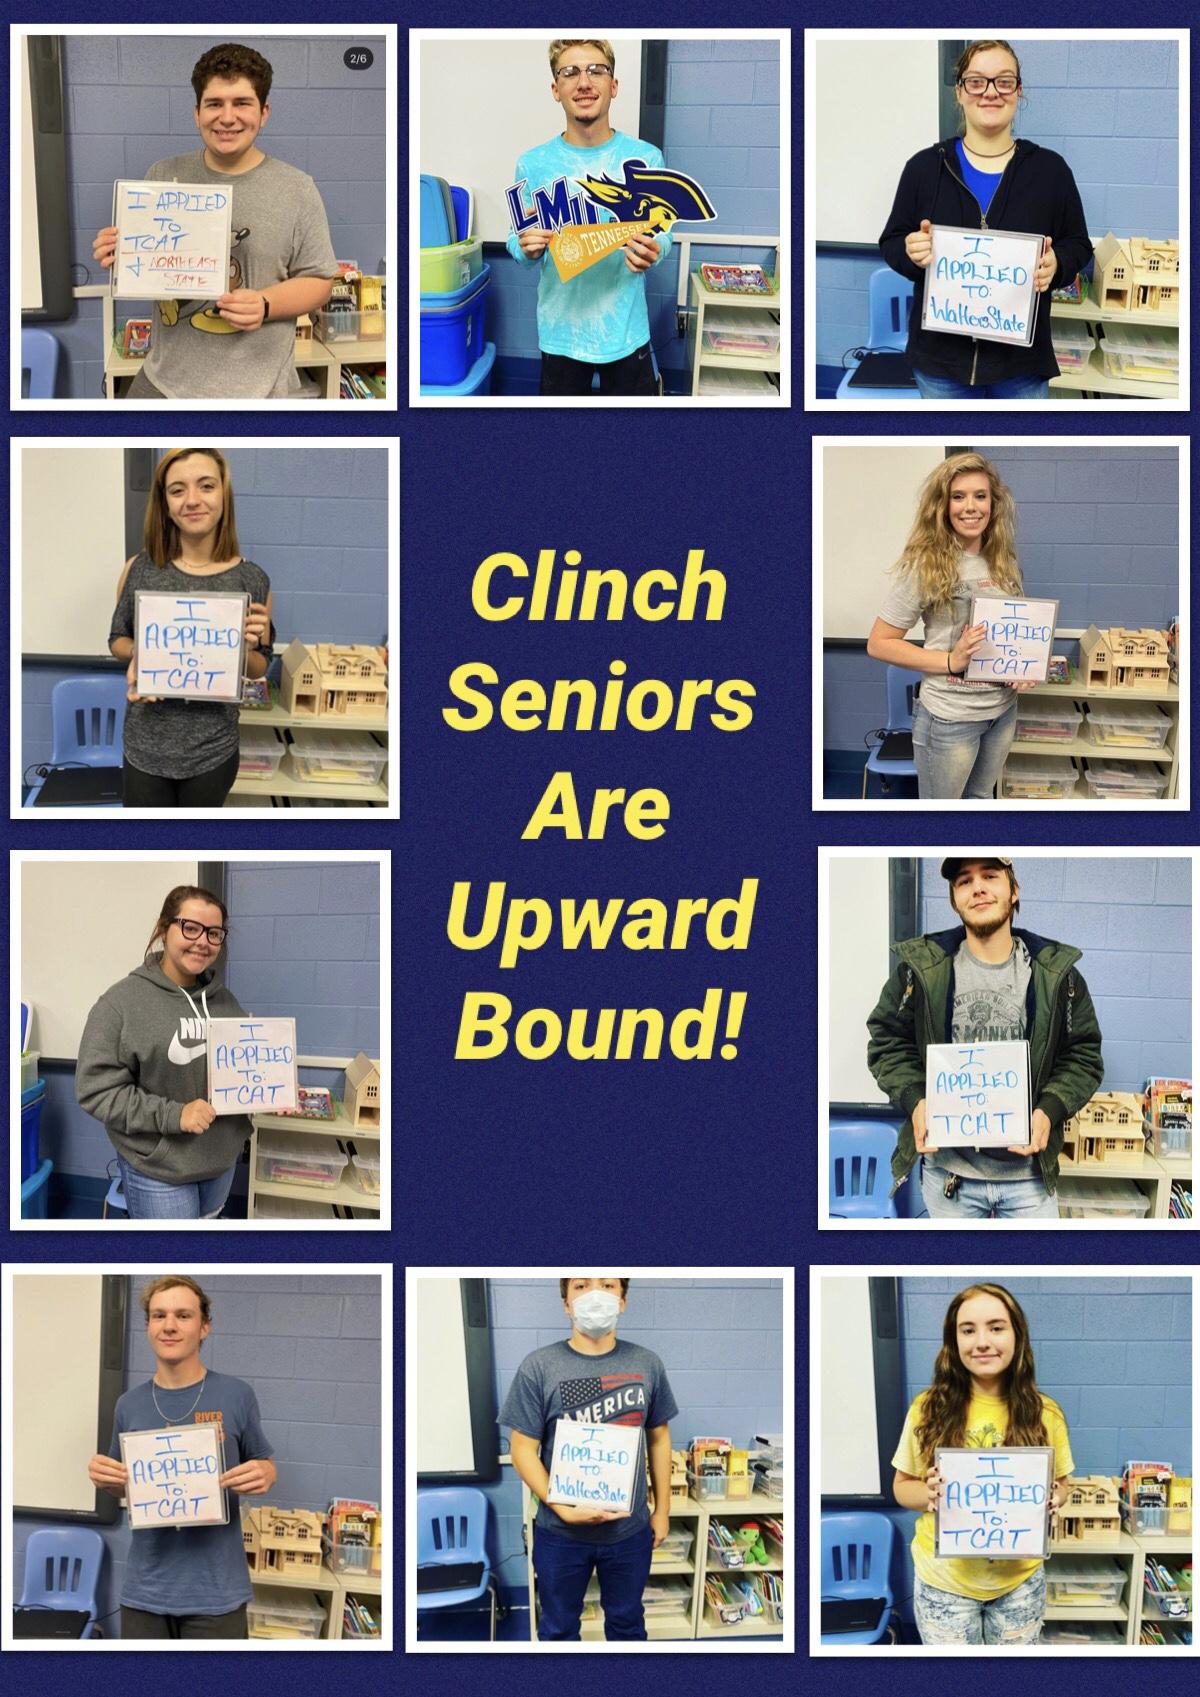 Clinch seniors are upward bound